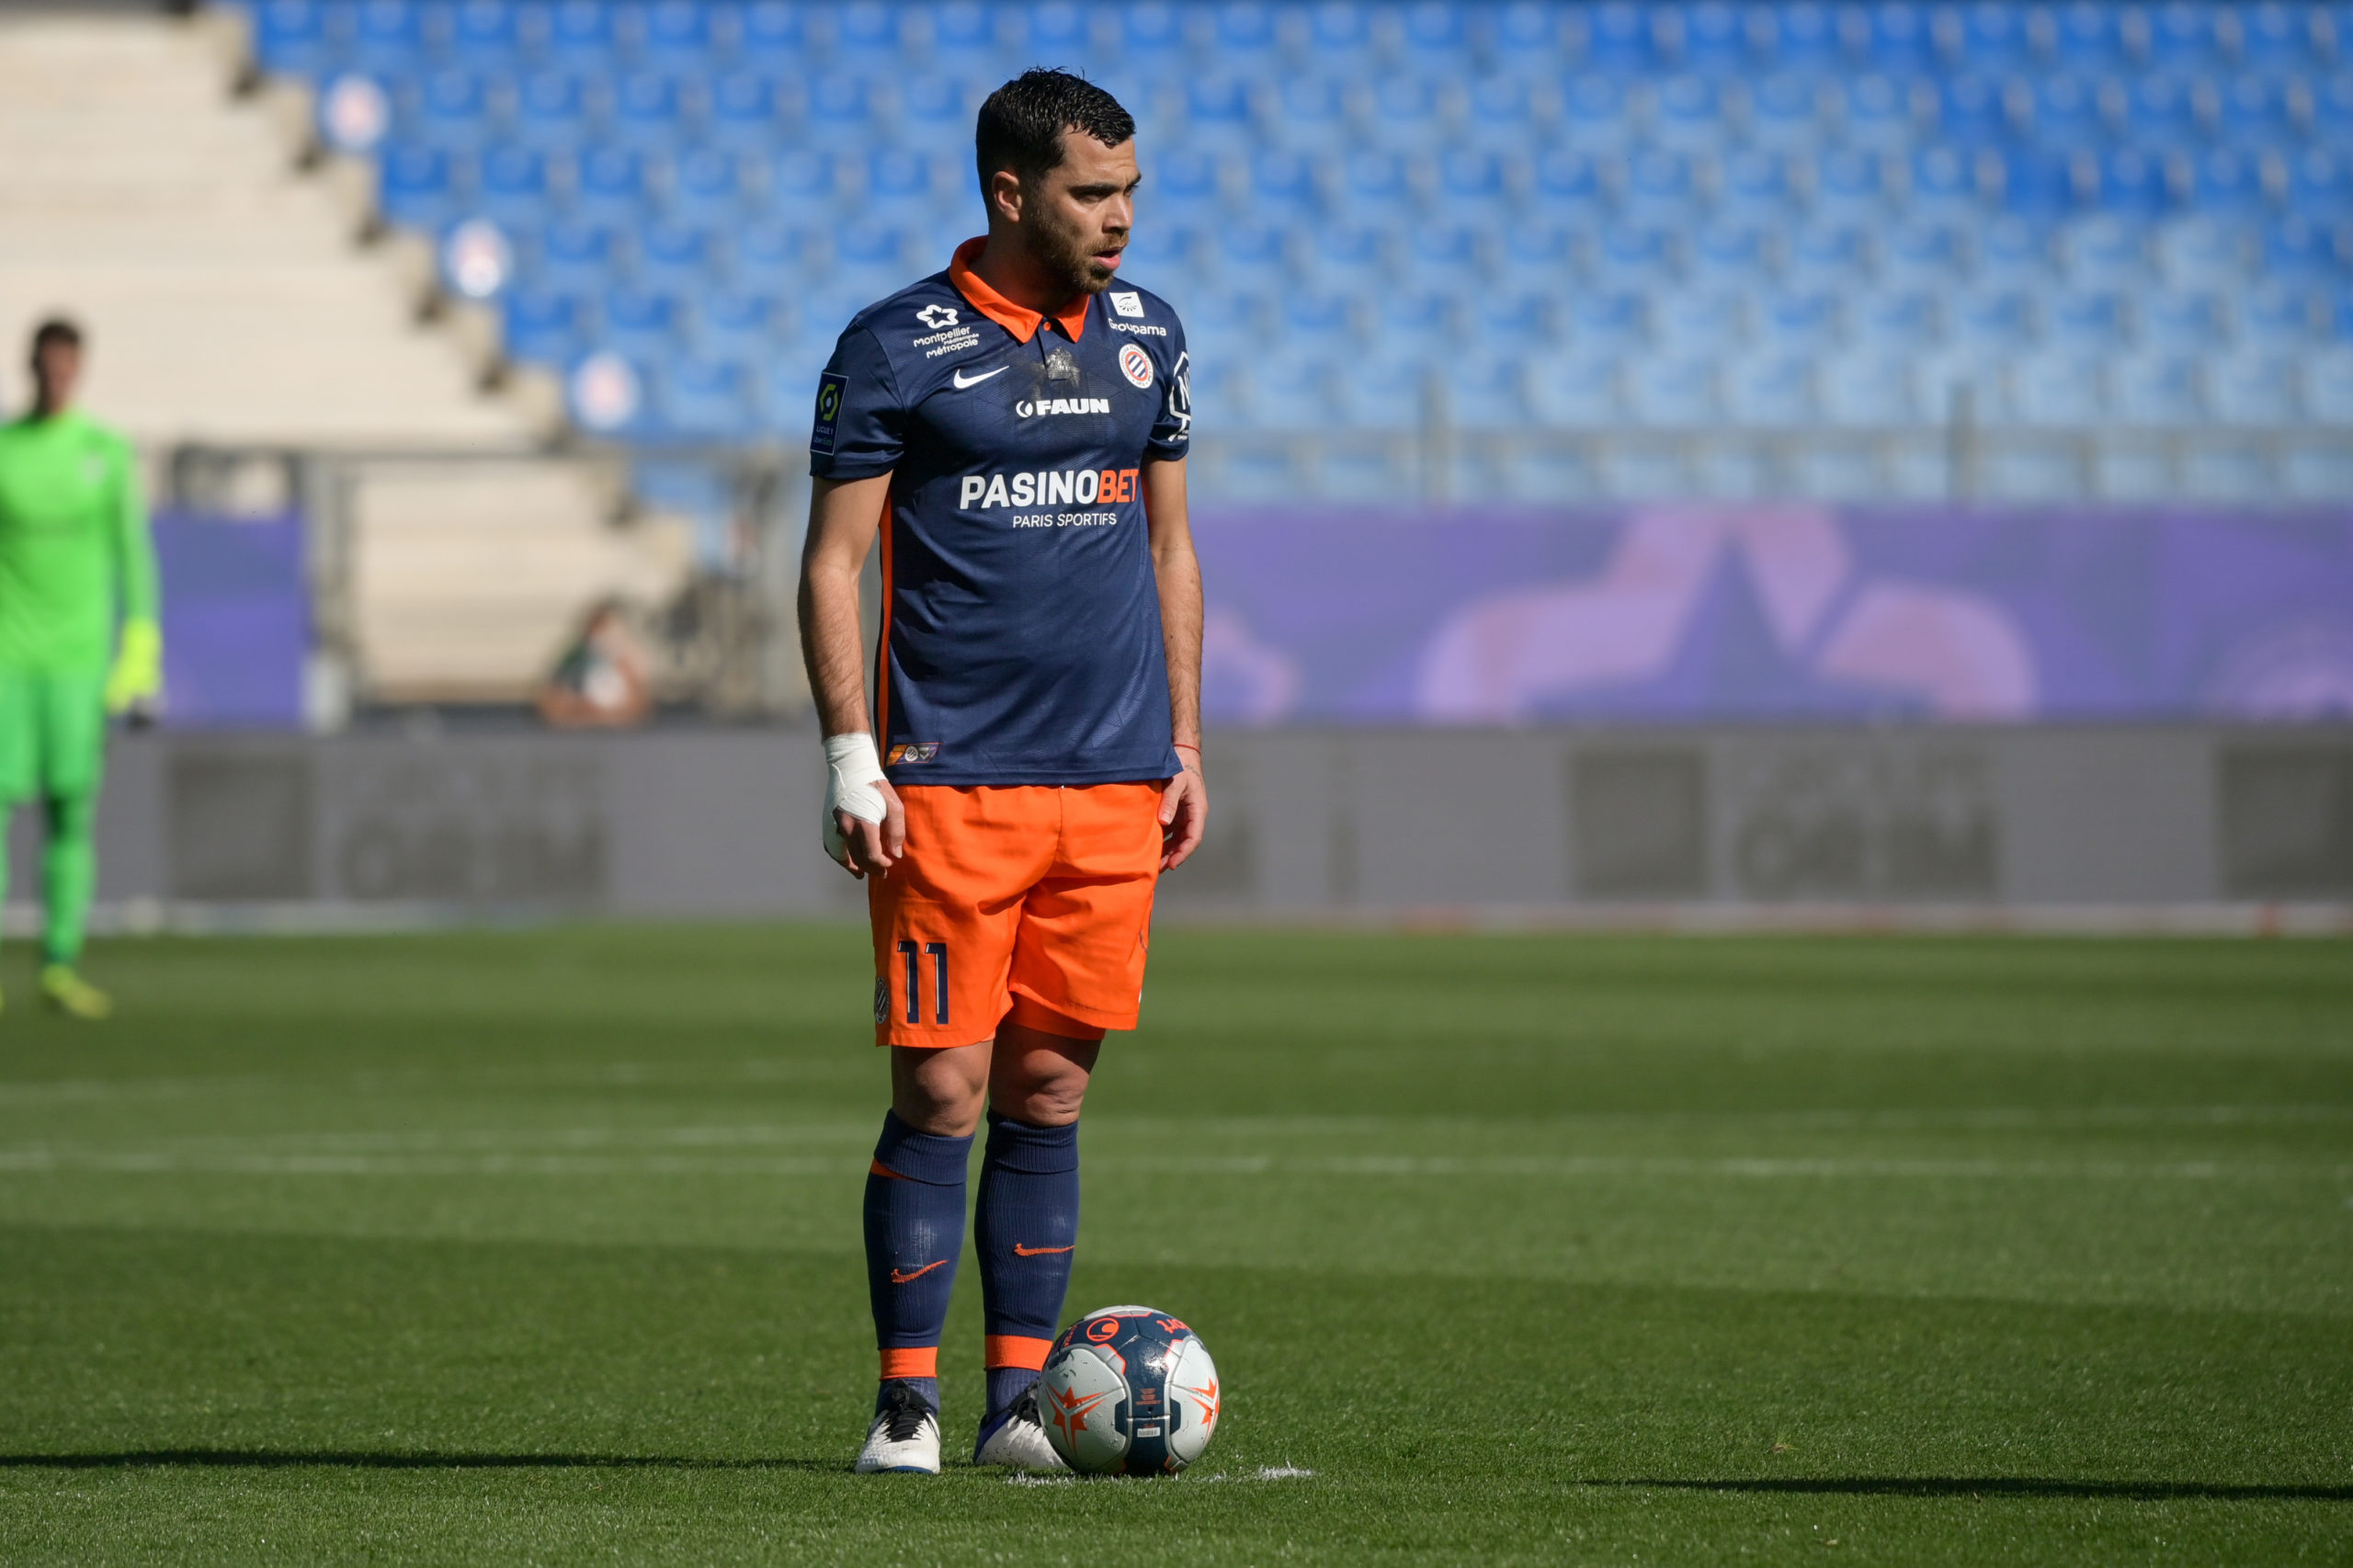 Mercato OM : Le profil de Teji Savanier idéal pour Marseille ?